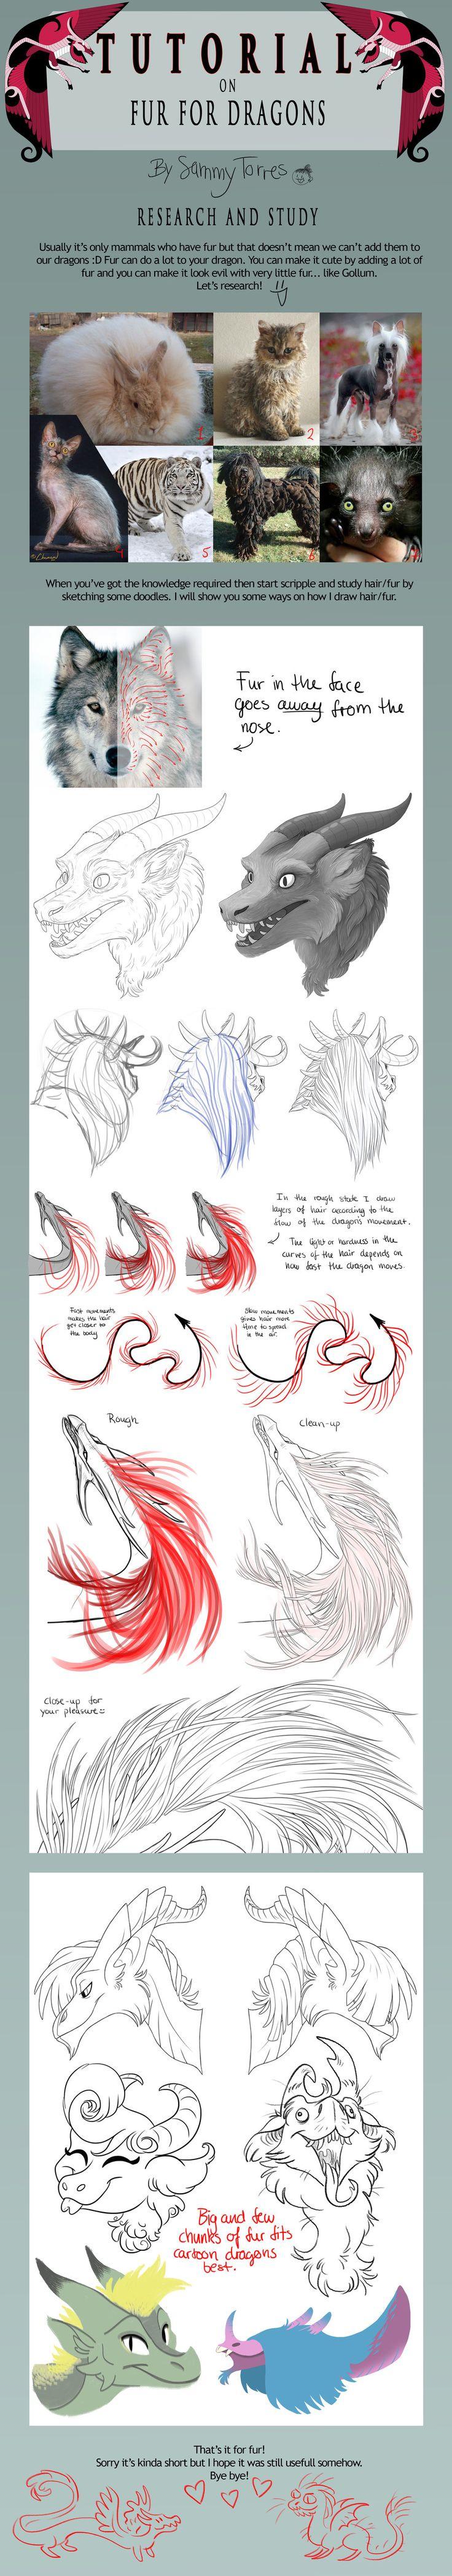 Pelos de dragões- dragon fuor reference